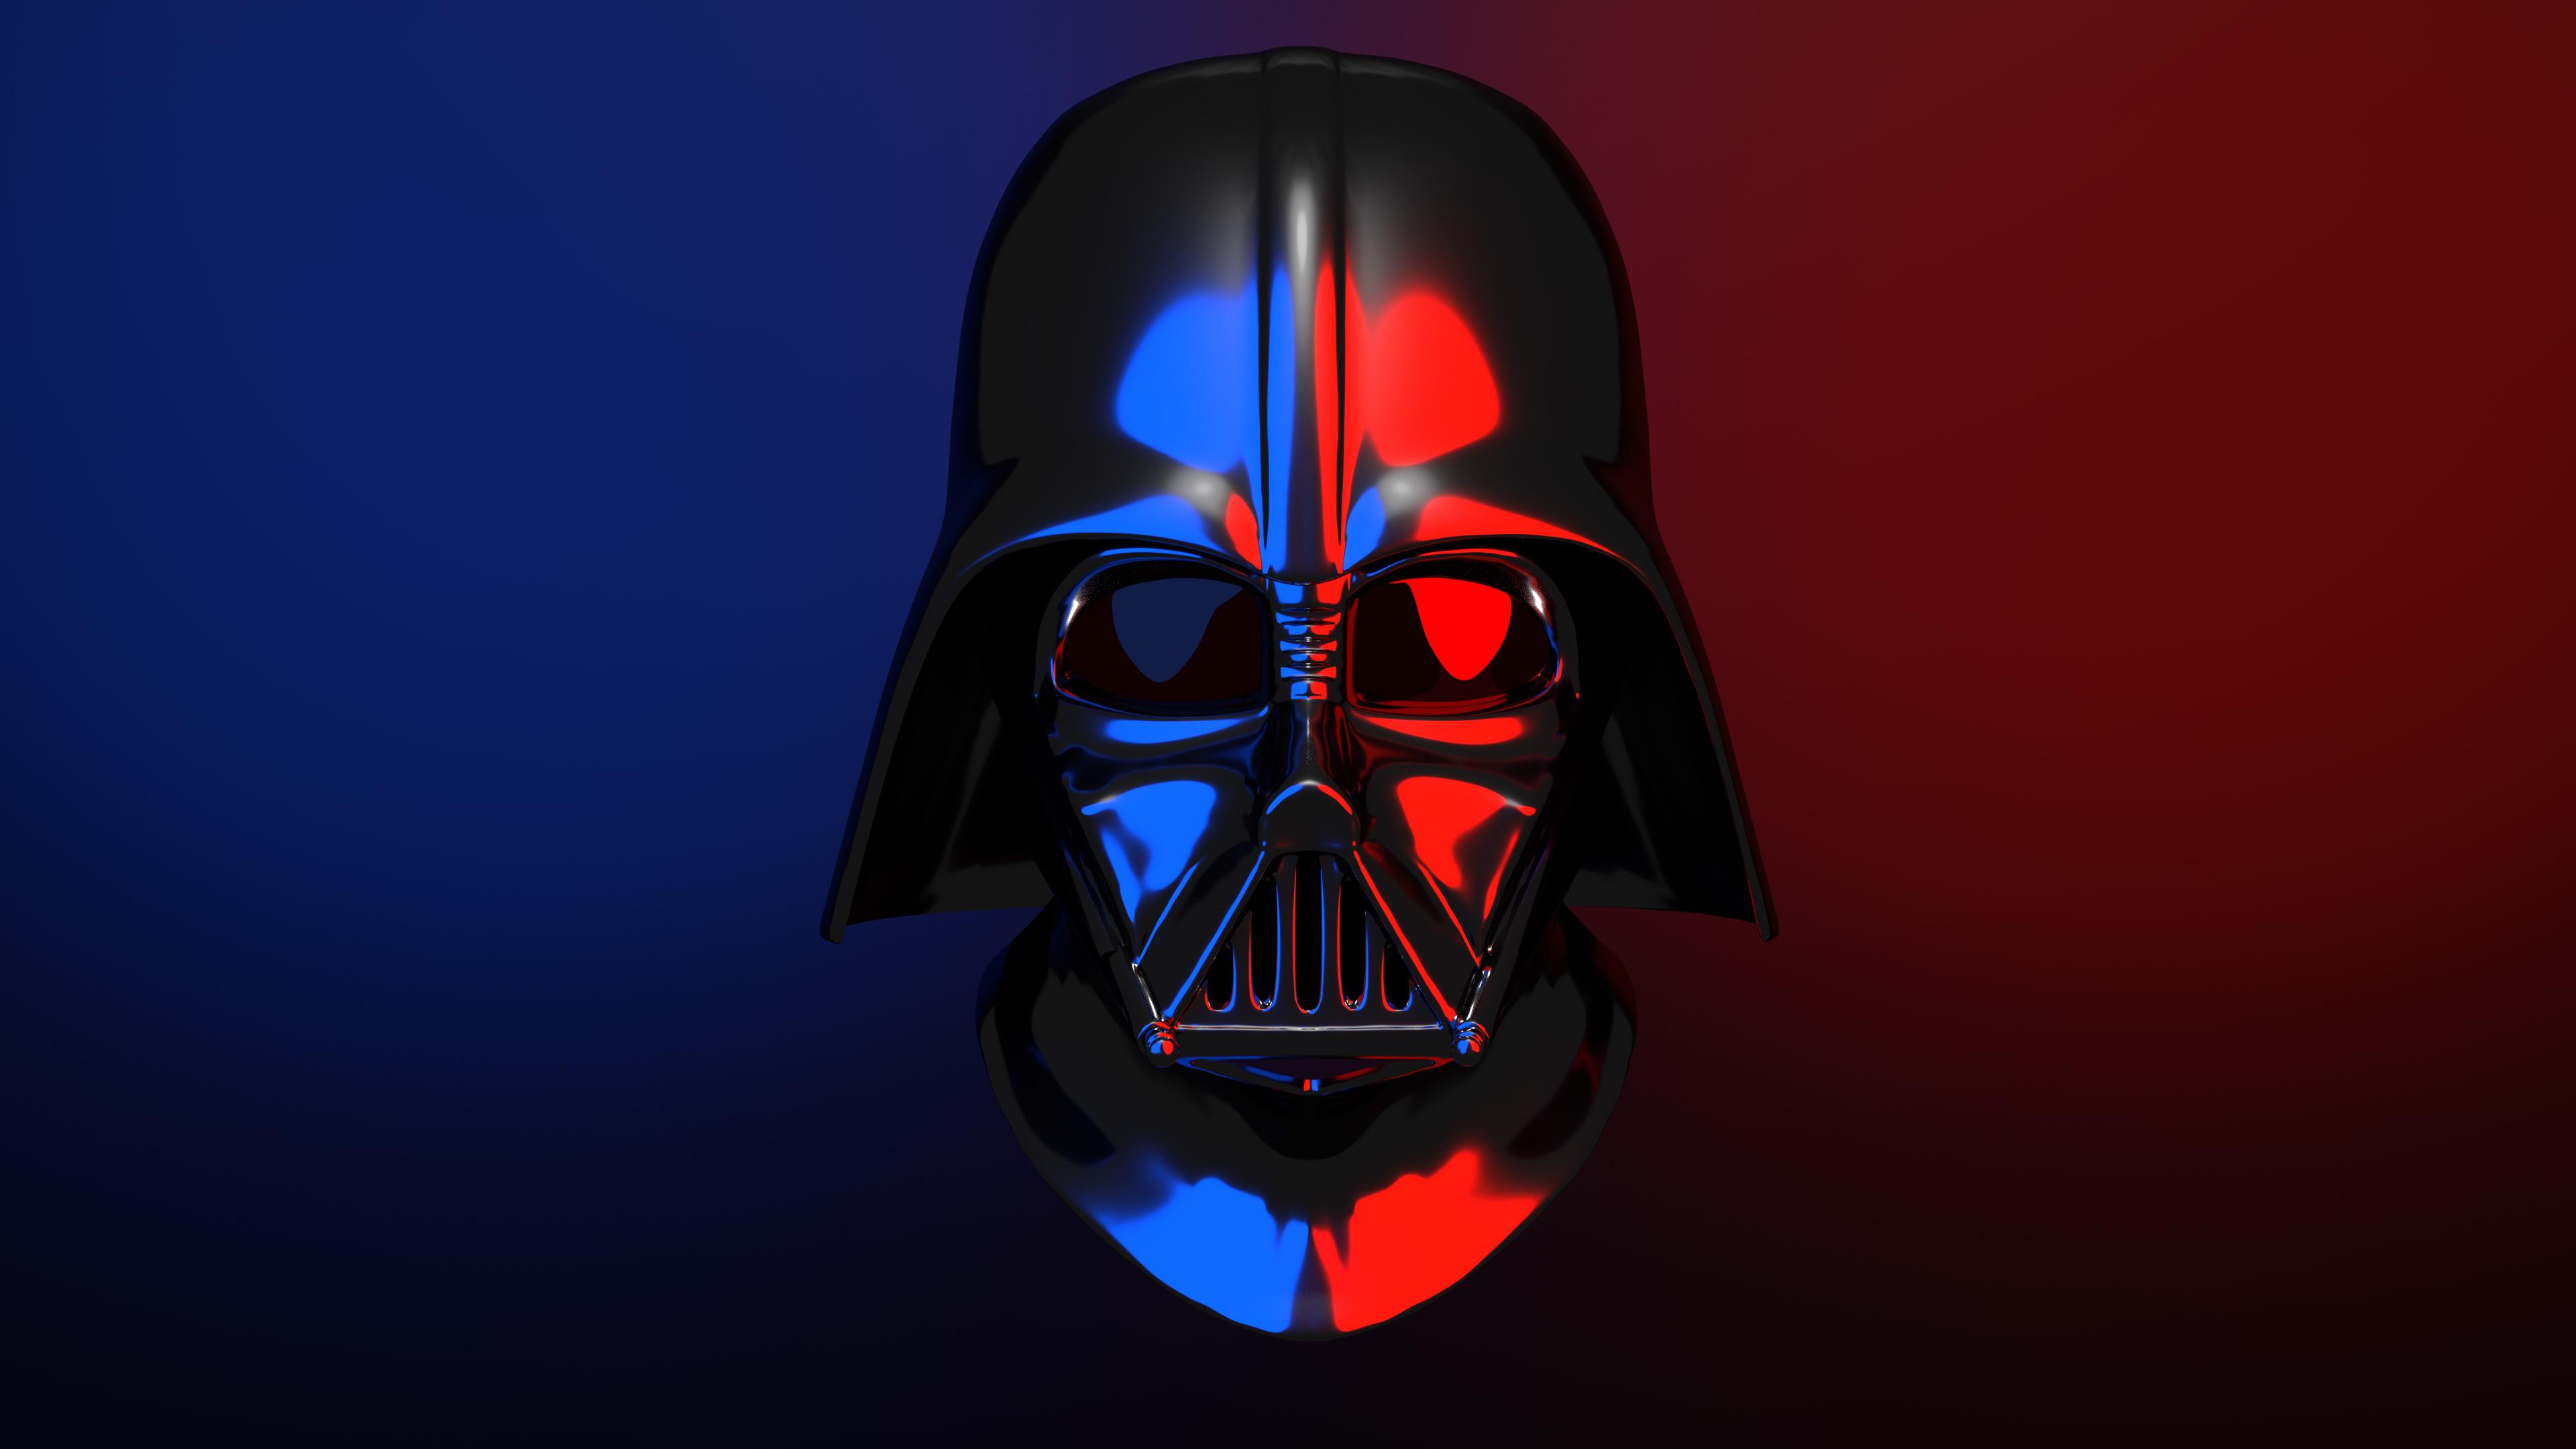 darth vader helmet 4k 1540754353 - Darth Vader Helmet 4K - movies wallpapers, helmet wallpapers, hd-wallpapers, digital art wallpapers, darth vader wallpapers, artwork wallpapers, artist wallpapers, 4k-wallpapers